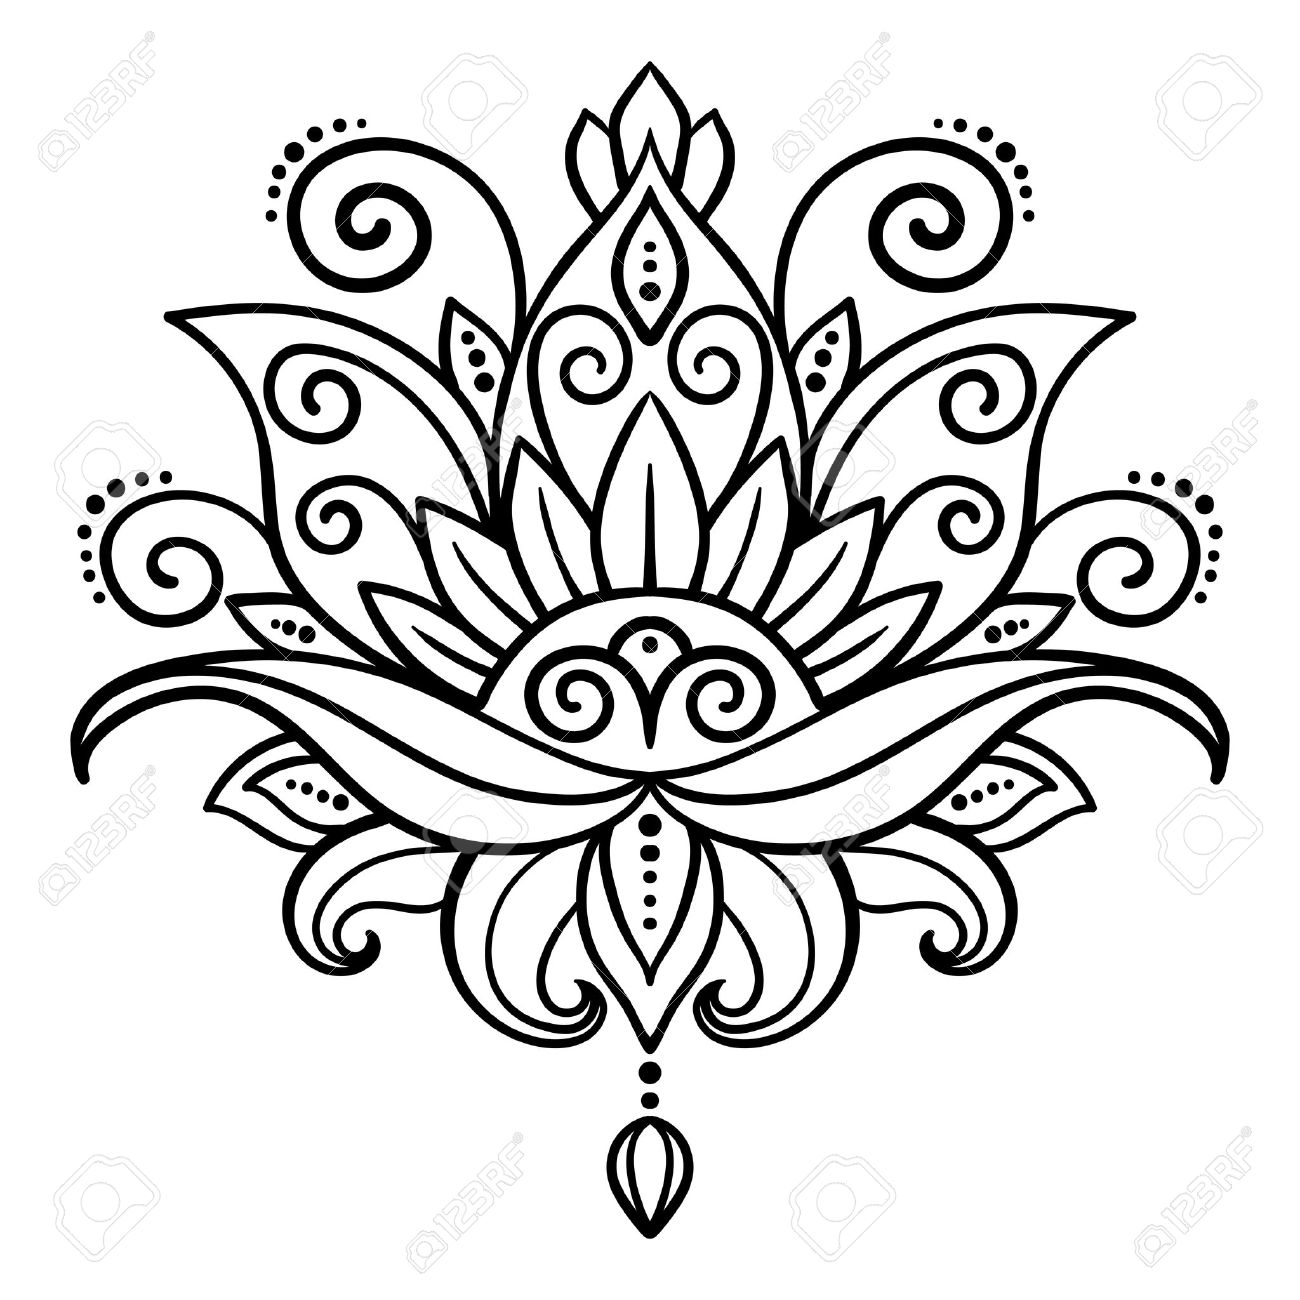 1300x1300 Vector, Abstract, Oriental Style, Flower, Lotus, Tattoo, Design